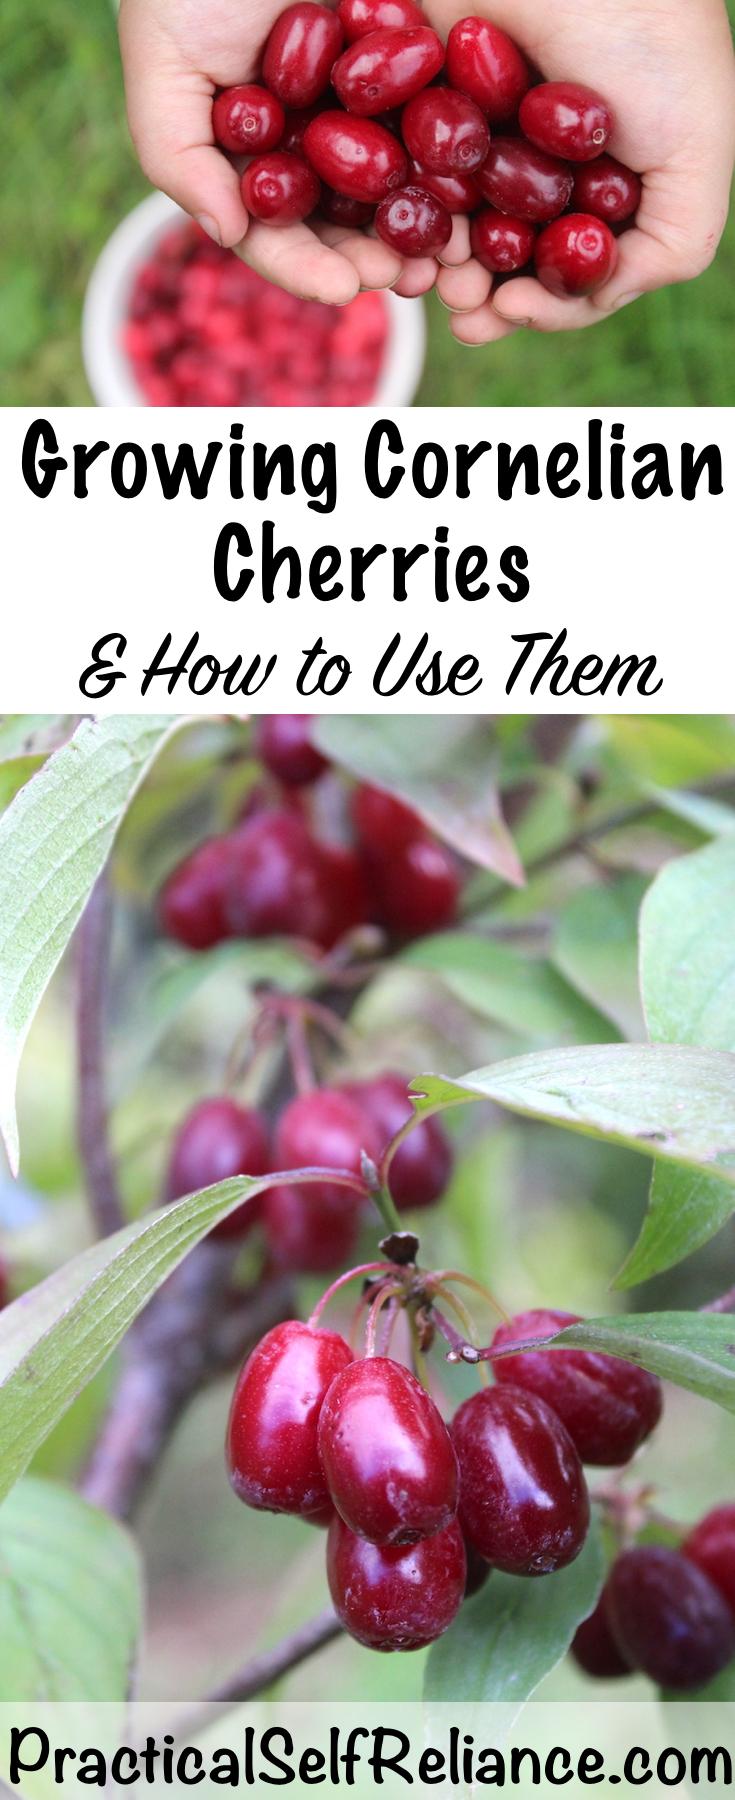 Growing Cornelian Cherries ~ How to Grow and Use Cornelian Cherries ~ Perfect for Permaculture Plantings #cornelian #cherries #permaculture #howtogrow #orchard #homesteading #selfsufficiency #growingfood